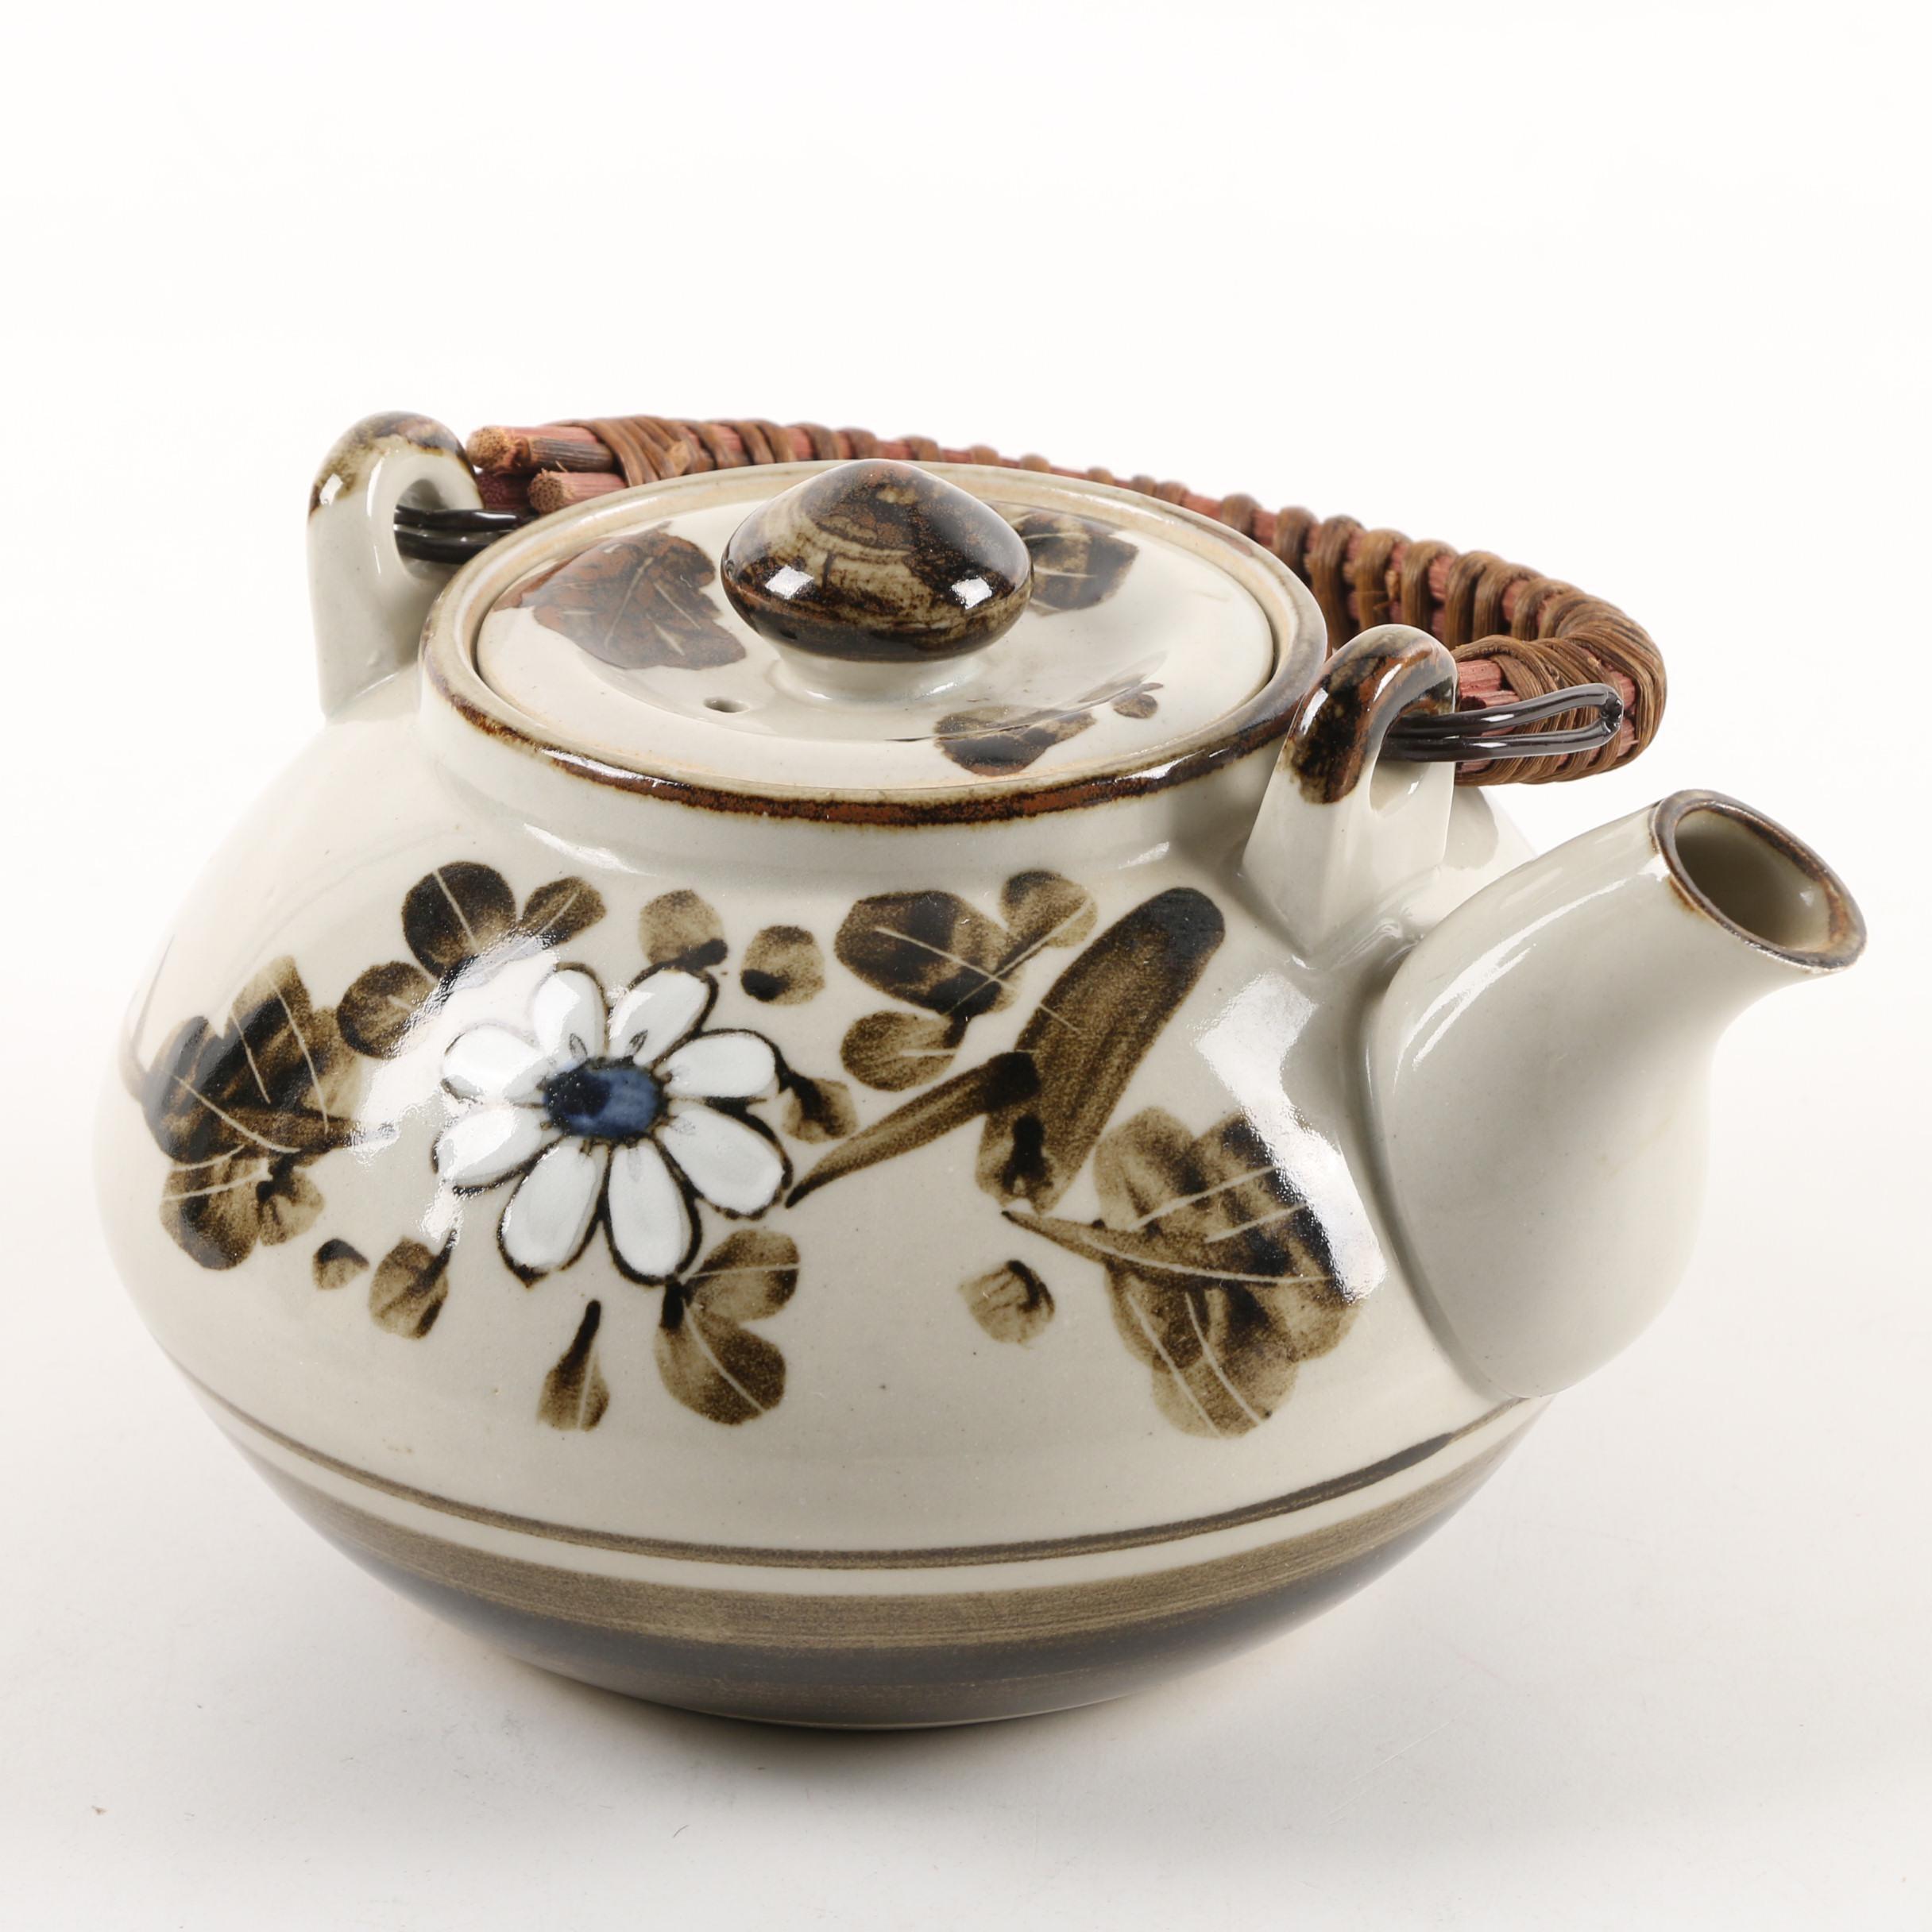 Vintage Otagiri Mercantile Company Japanese Teapot